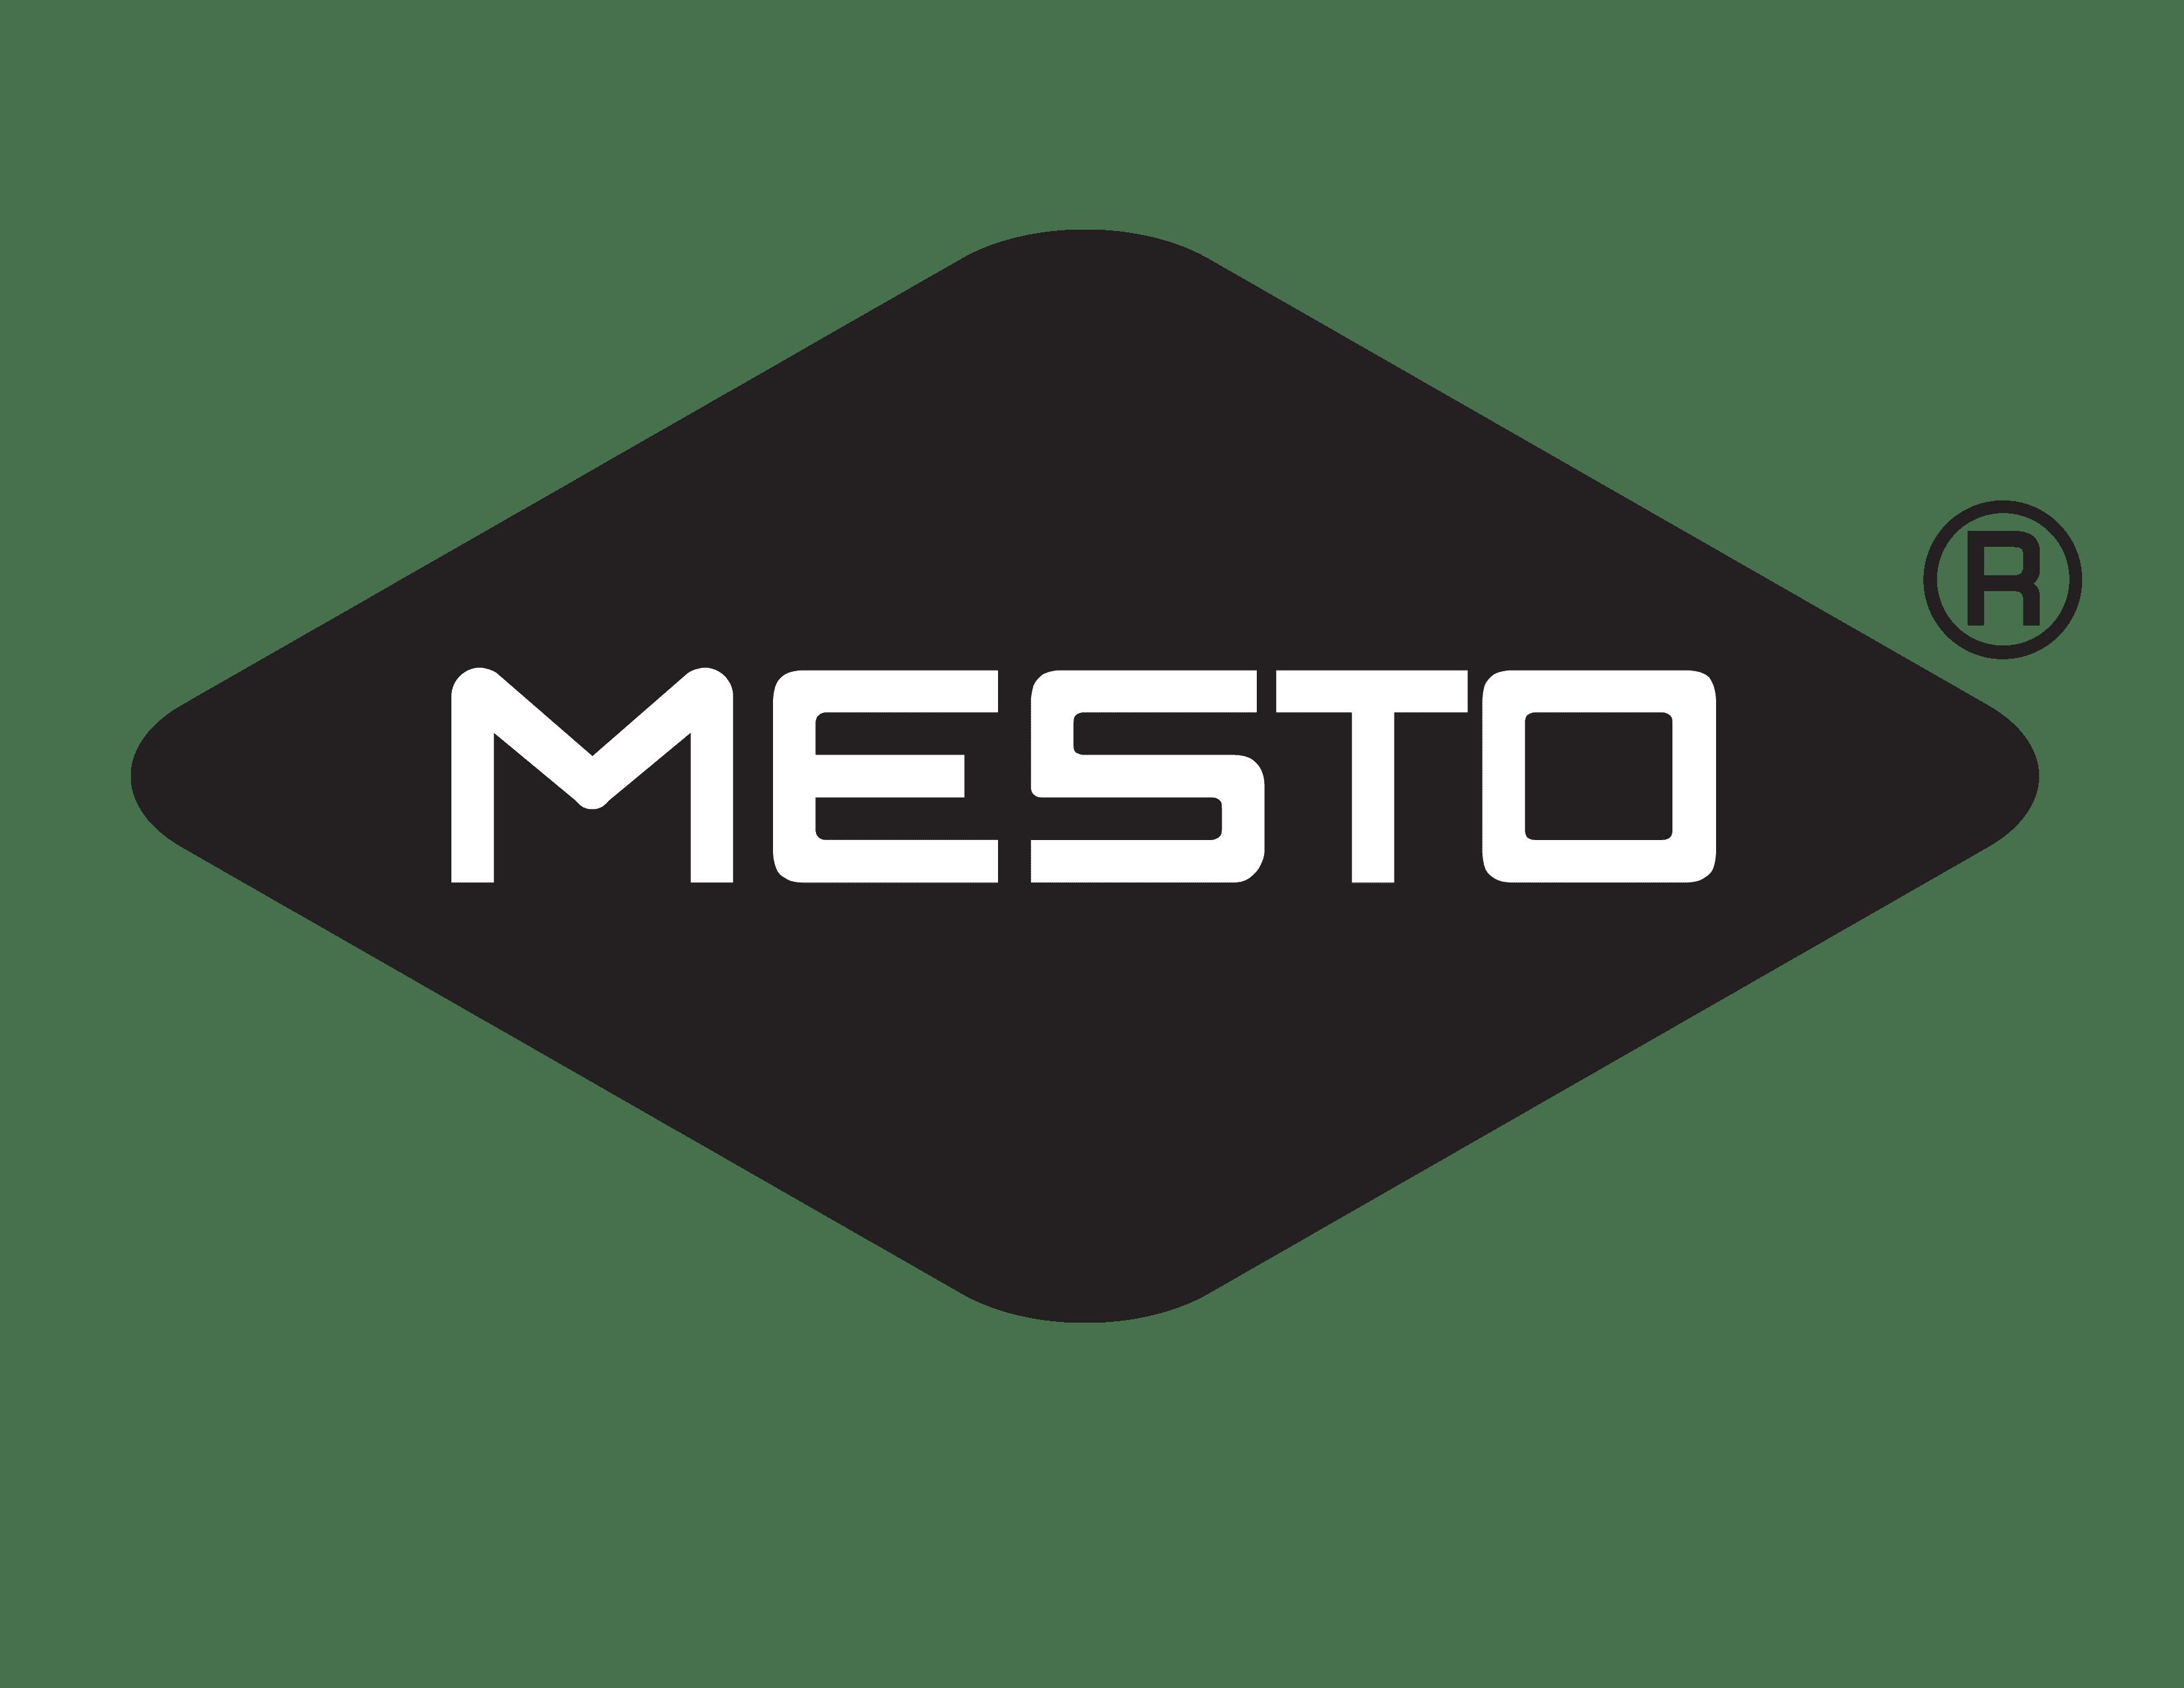 mesto logo-01